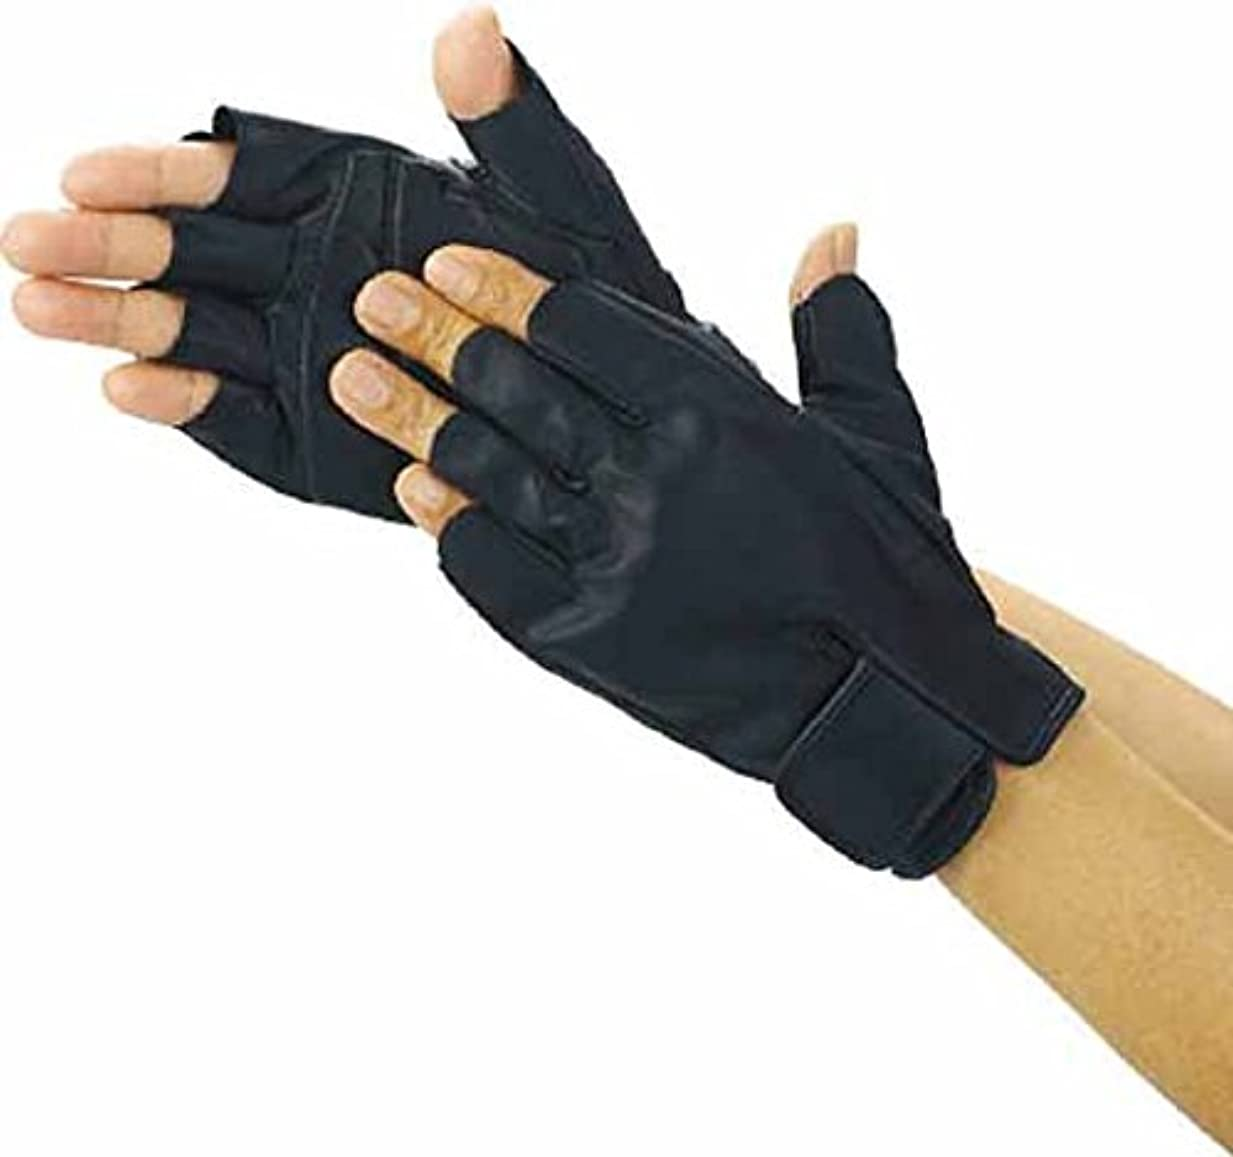 TRUSCO(トラスコ) 防振防滑手袋 ハーフフィンガー Mサイズ TPG855-M